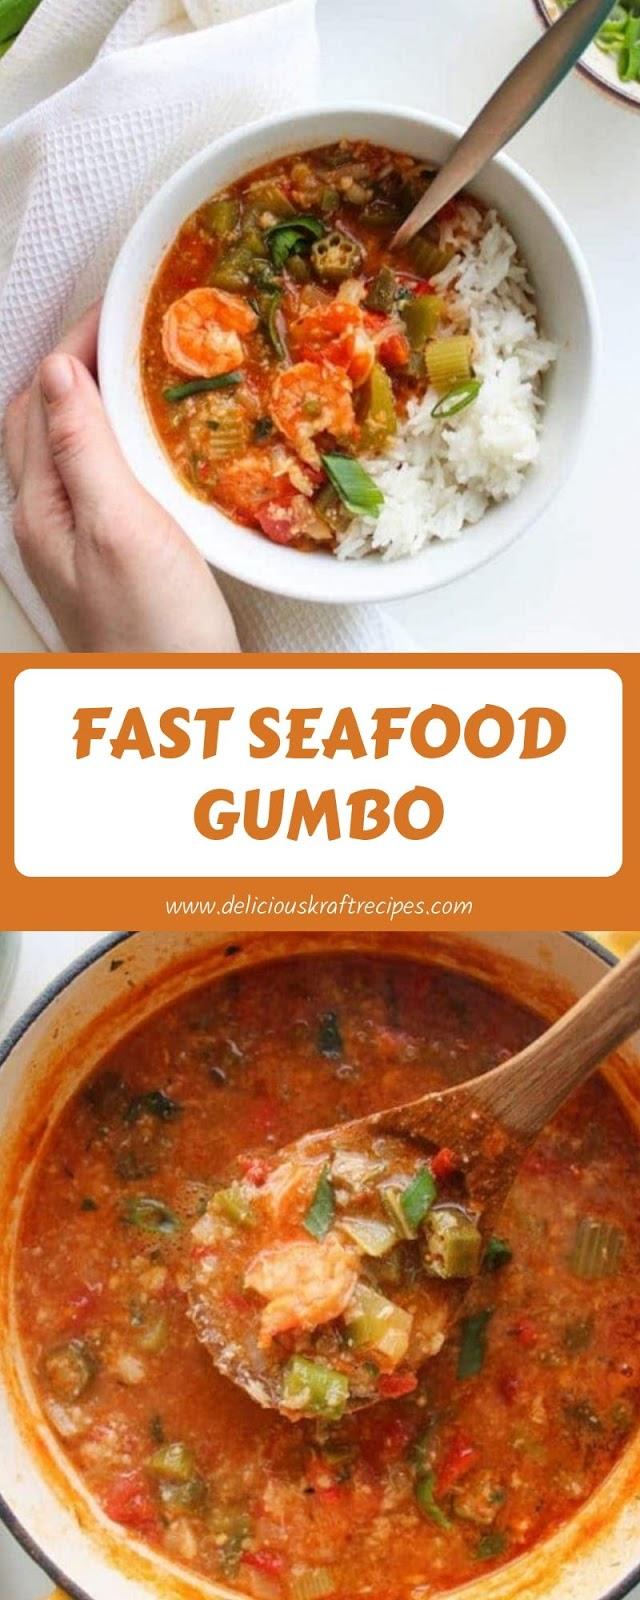 FAST SEAFOOD GUMBO